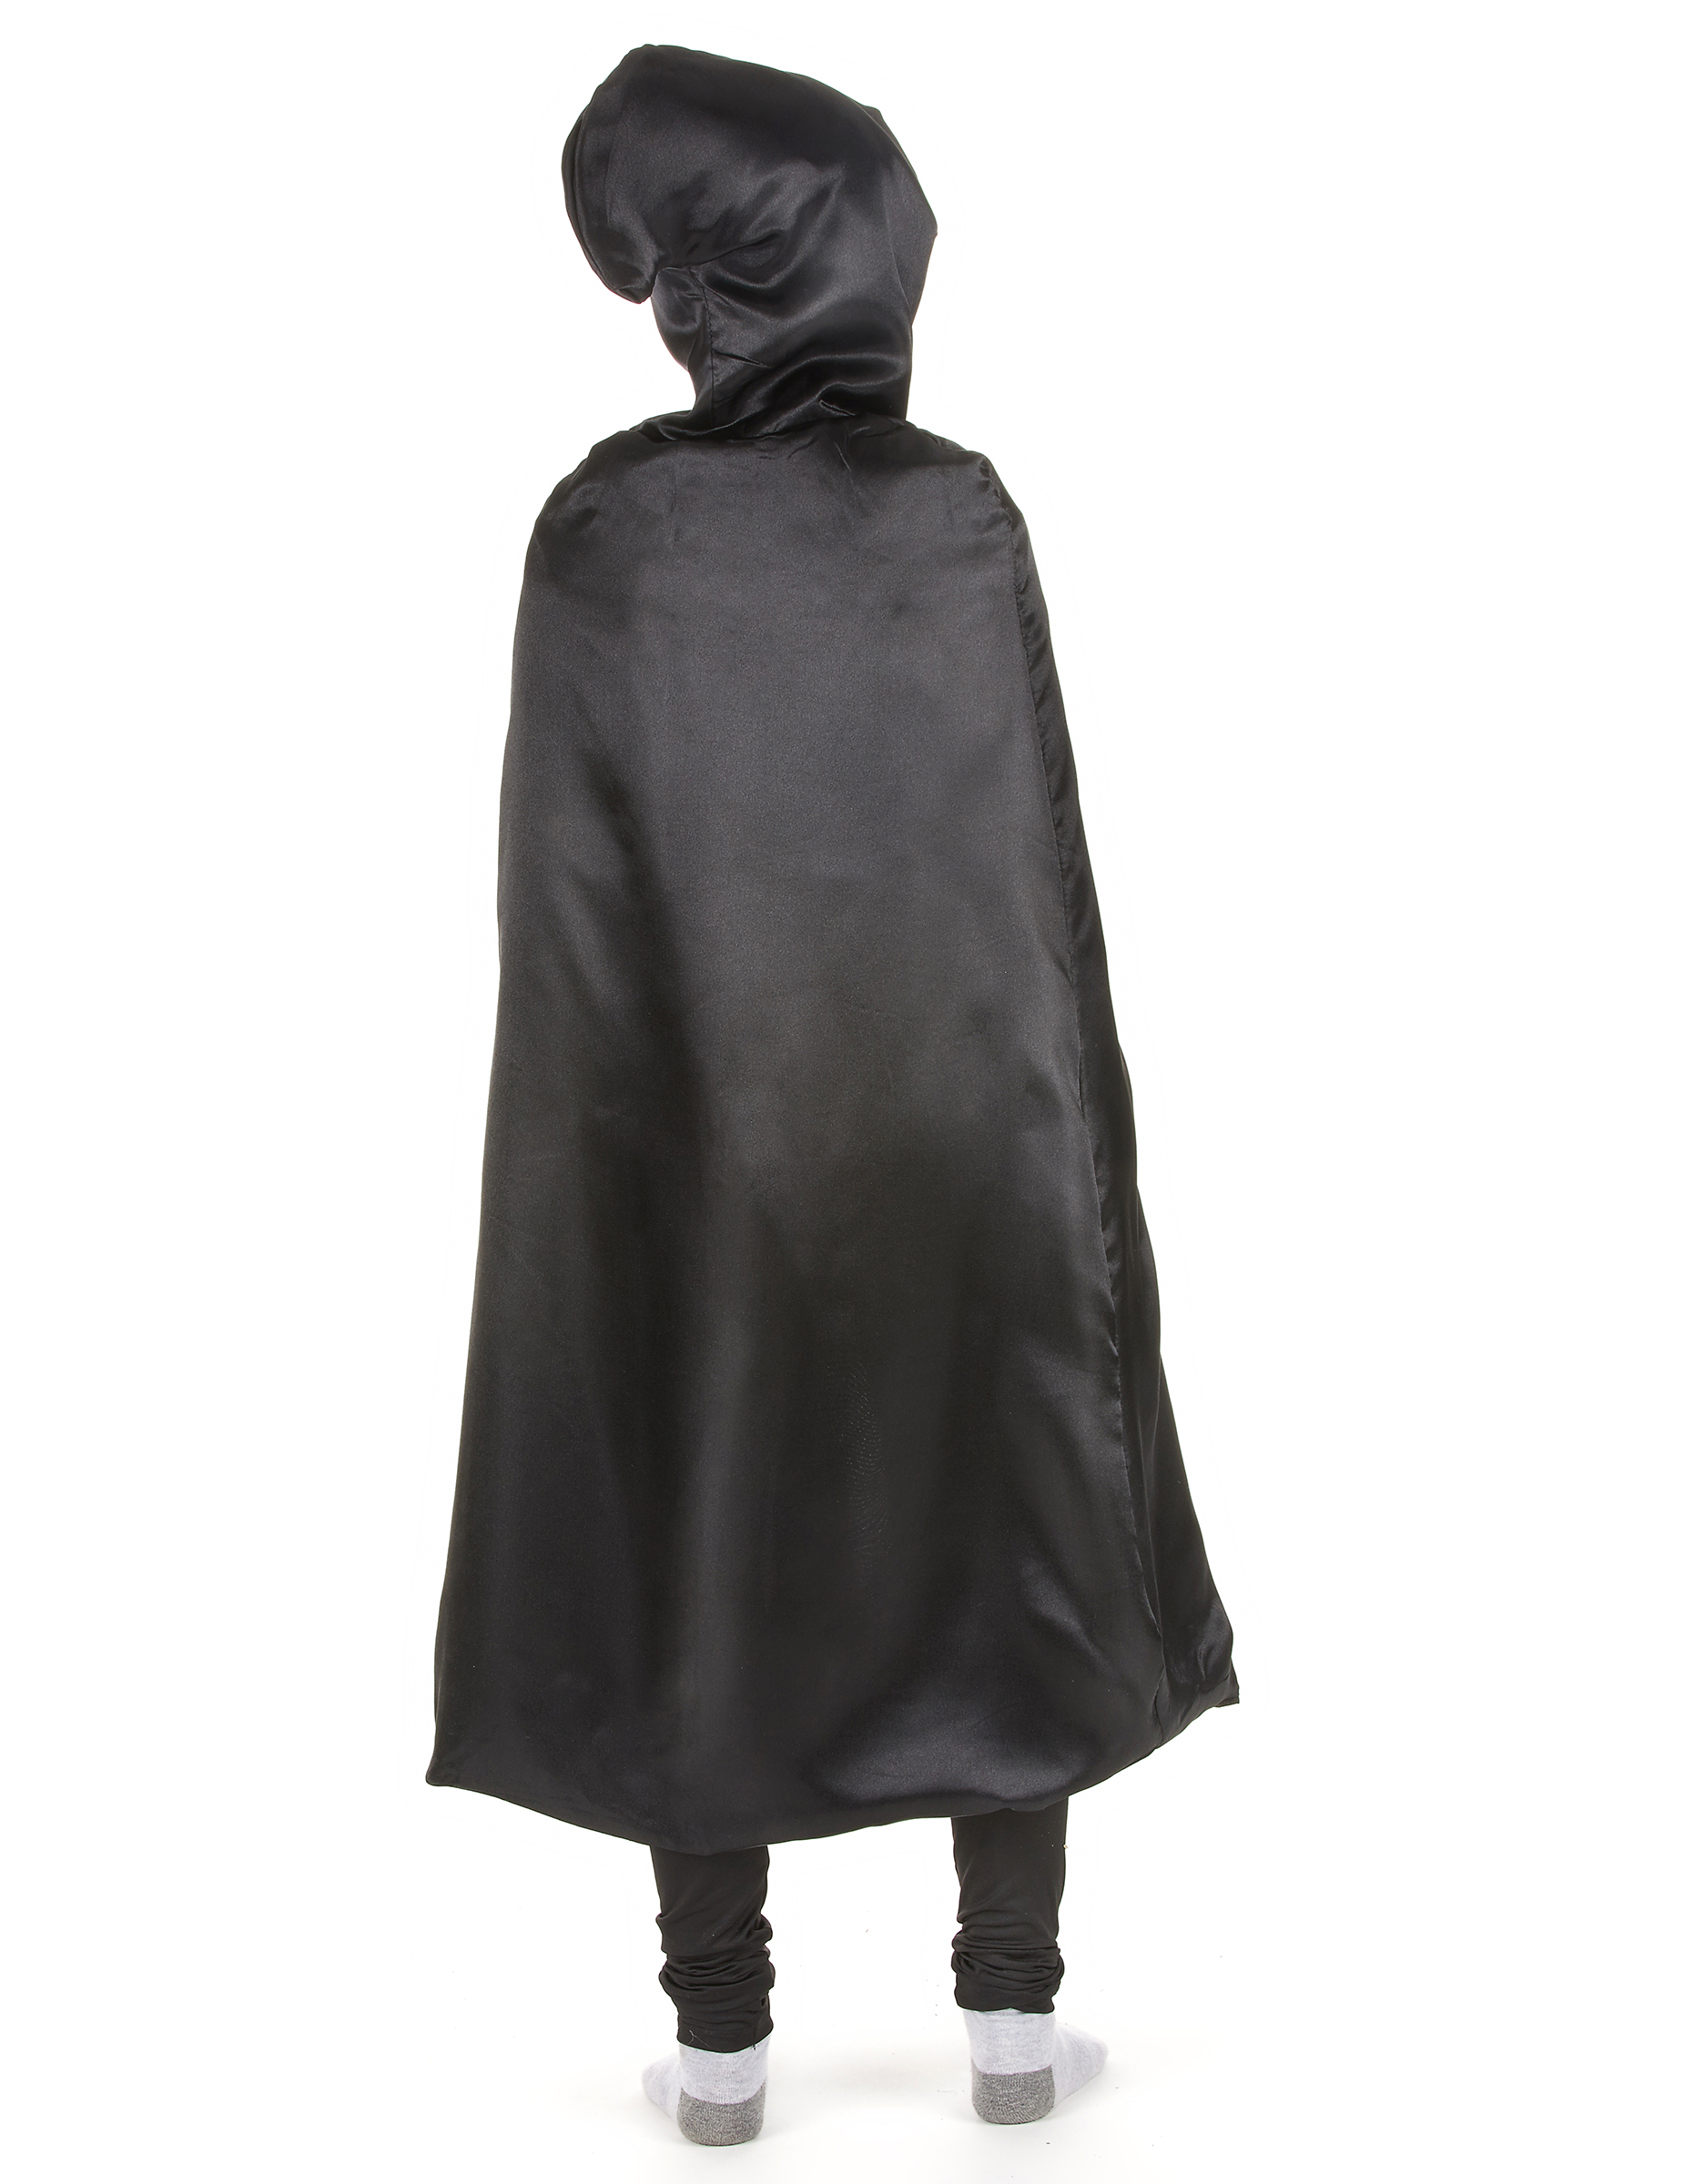 schwarzer umhang mit kapuze accessoires und g nstige. Black Bedroom Furniture Sets. Home Design Ideas